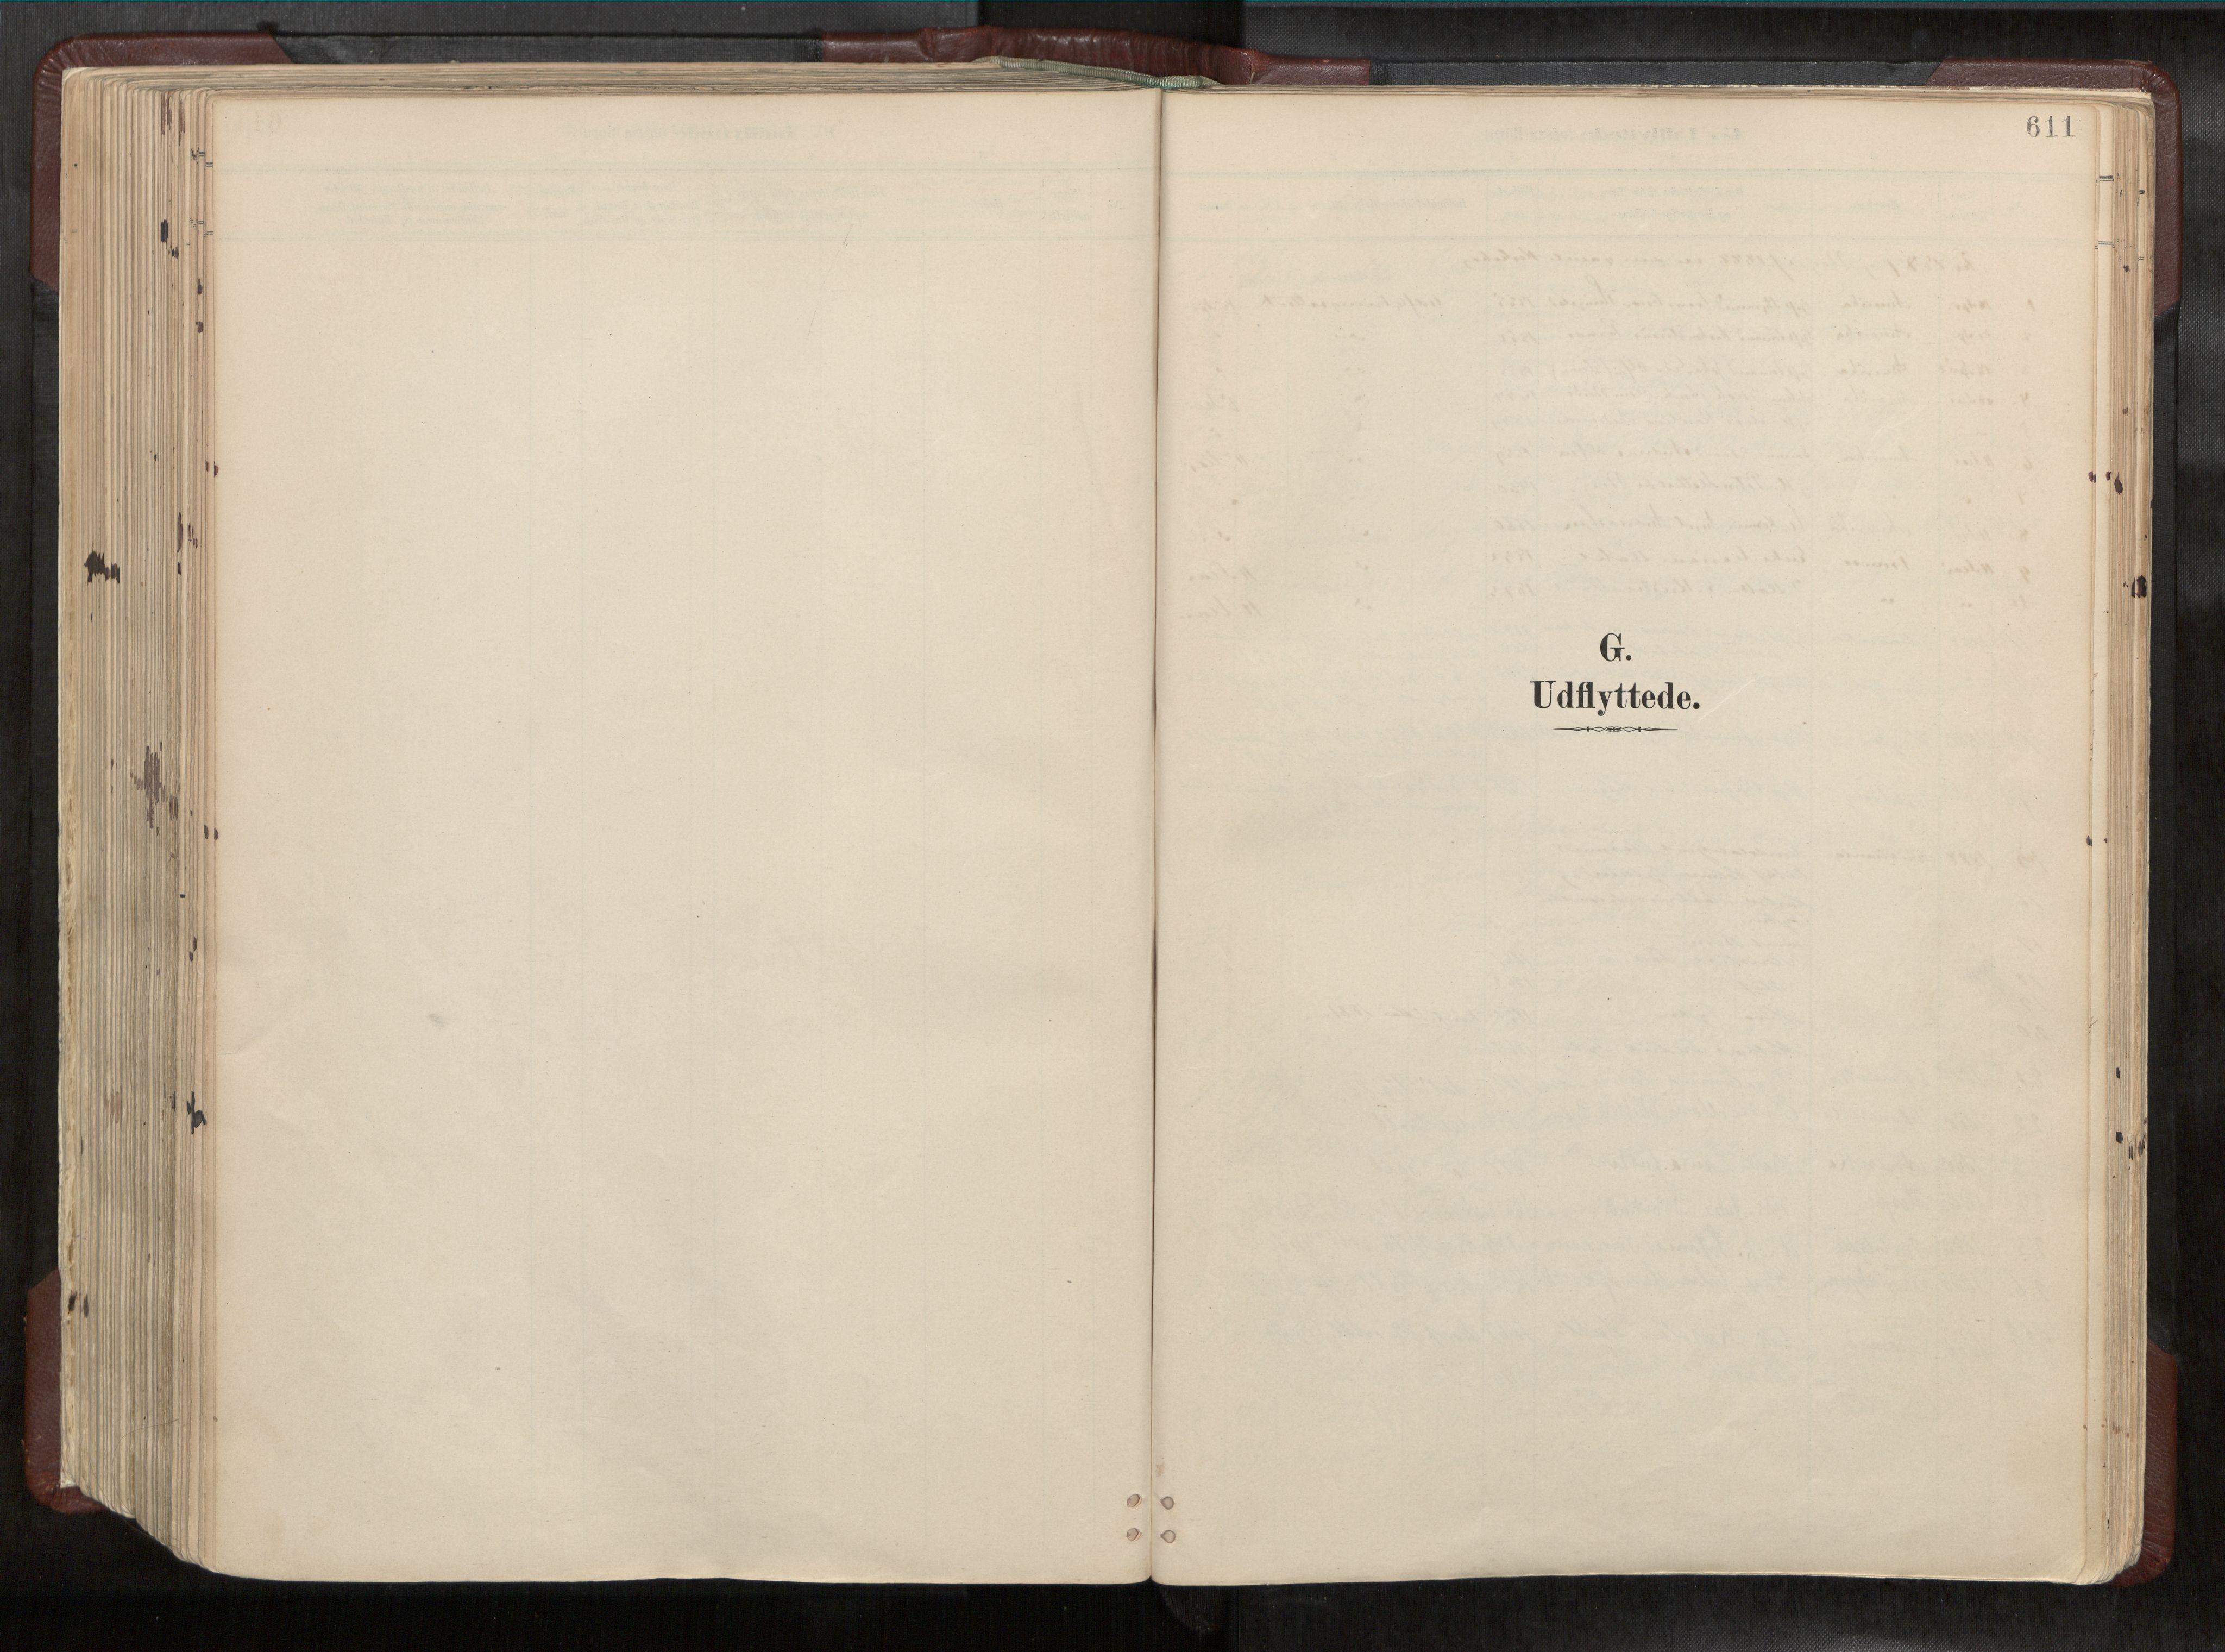 SAT, Ministerialprotokoller, klokkerbøker og fødselsregistre - Nord-Trøndelag, 768/L0579a: Ministerialbok nr. 768A14, 1887-1931, s. 611